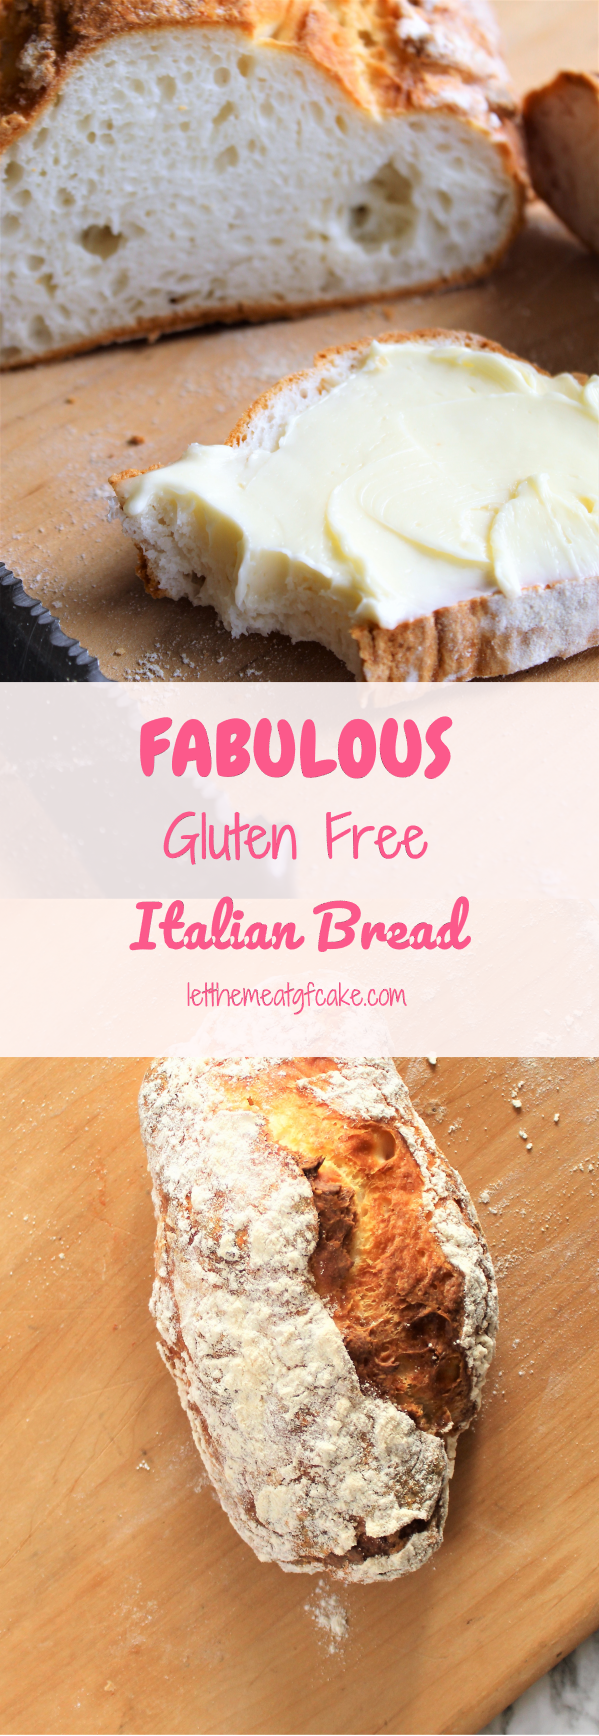 Fabulous Gluten Free Italian Bread #glutenfree